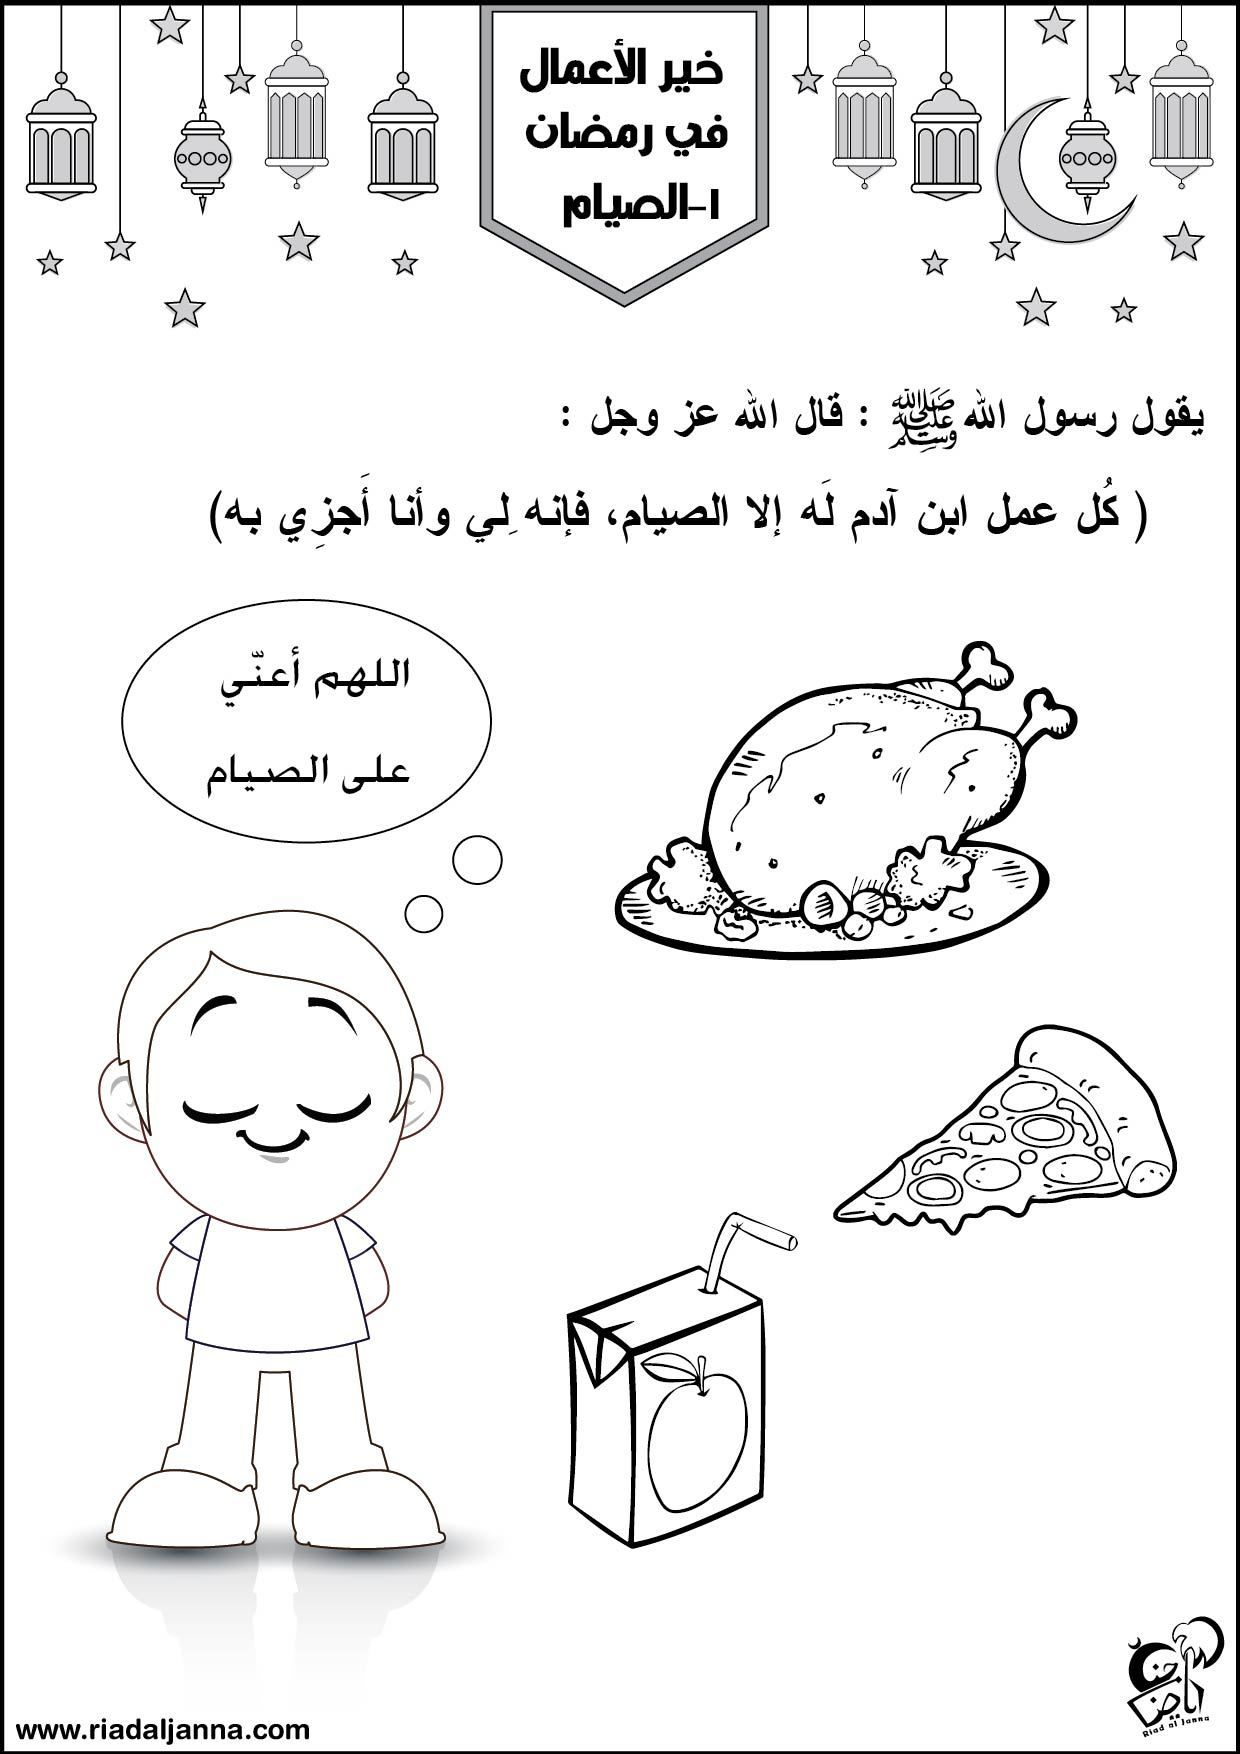 نشاطات رمضانية 01 Jpg 1 240 1 754 Pixels Muslim Kids Activities Ramadan Activities Islamic Kids Activities